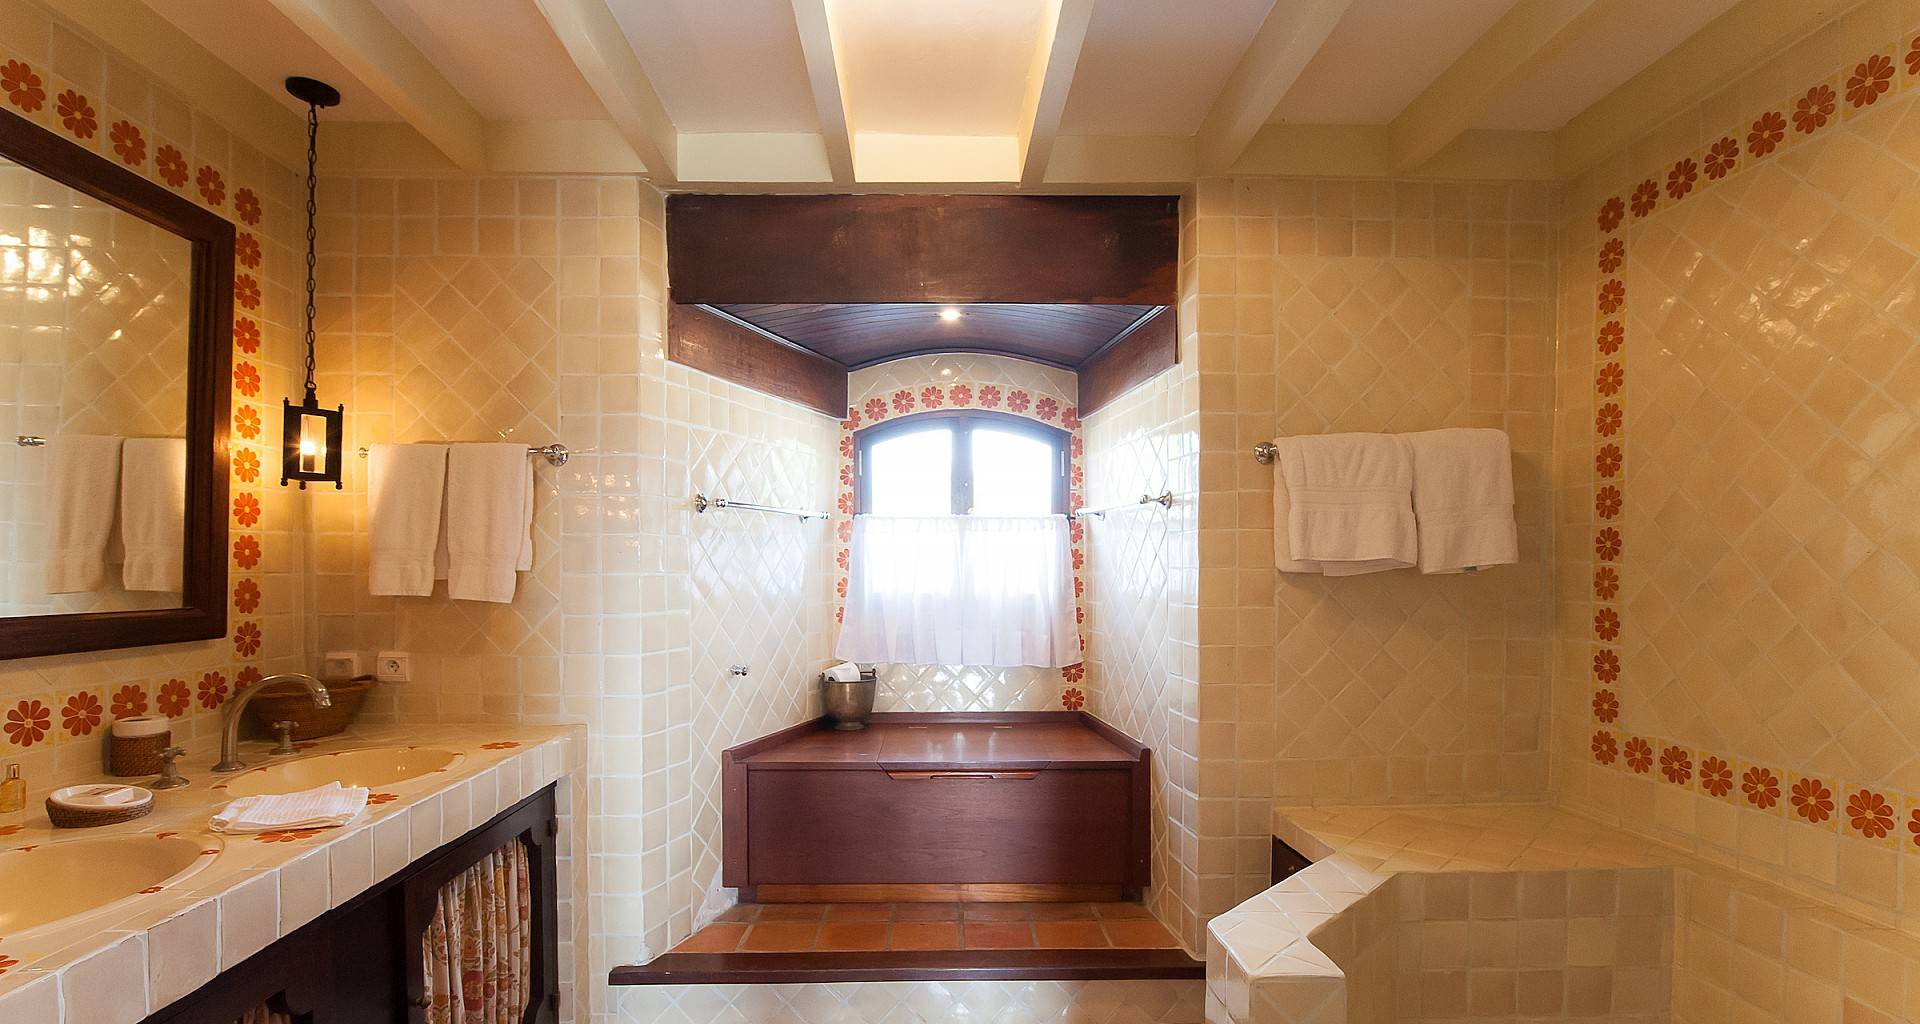 Villa Maison Mexicaine Bedroom 1